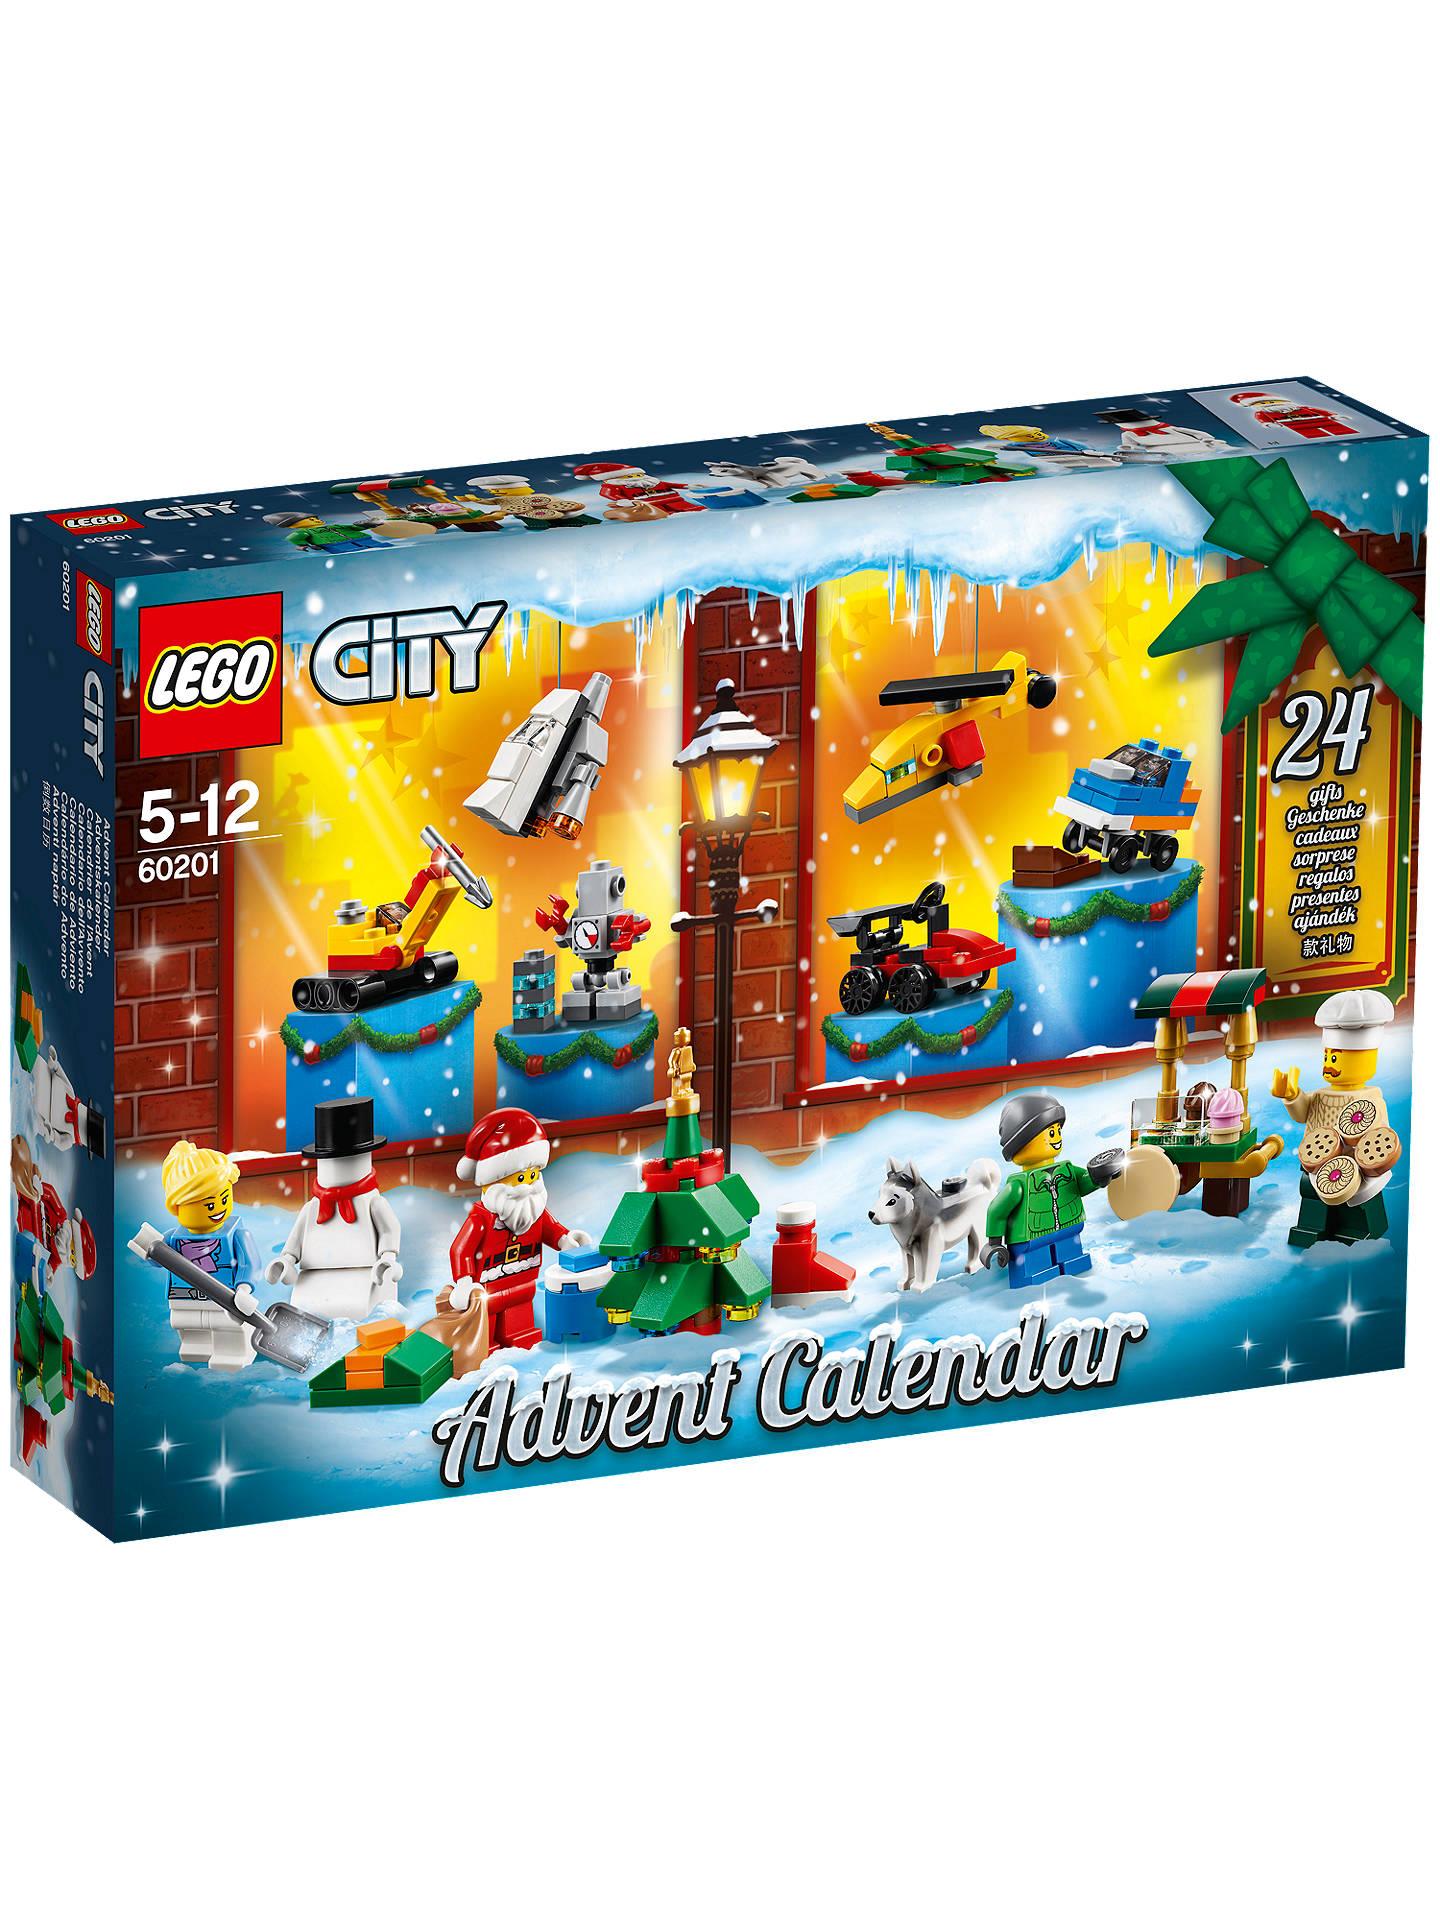 t mobile adventi naptár LEGO City 60201 Advent Calendar at John Lewis & Partners t mobile adventi naptár